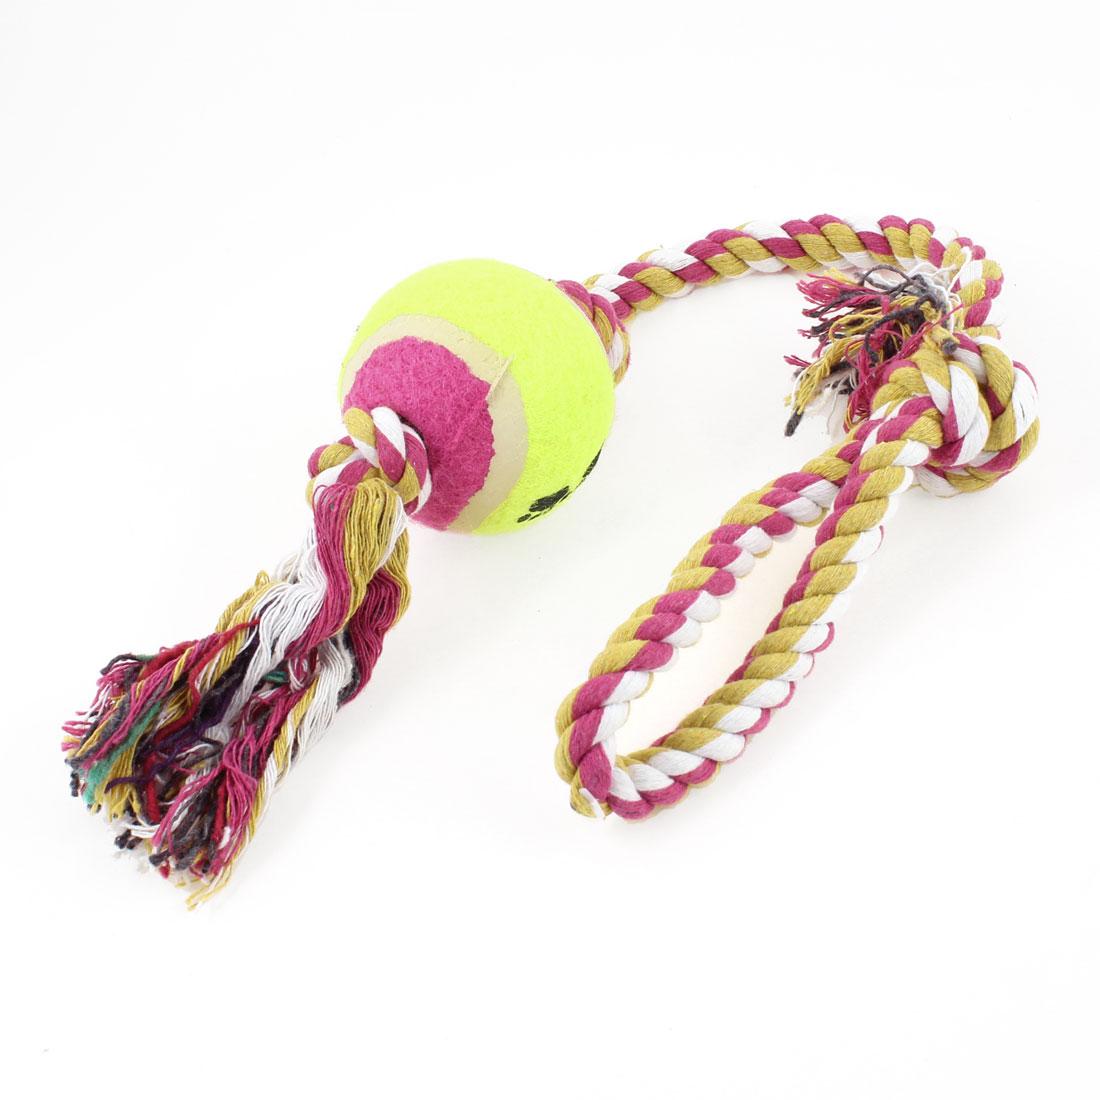 52cm Long Pet Dog Puppy Yellowgreen Fuchsia Ball Knot Tug Training Toy